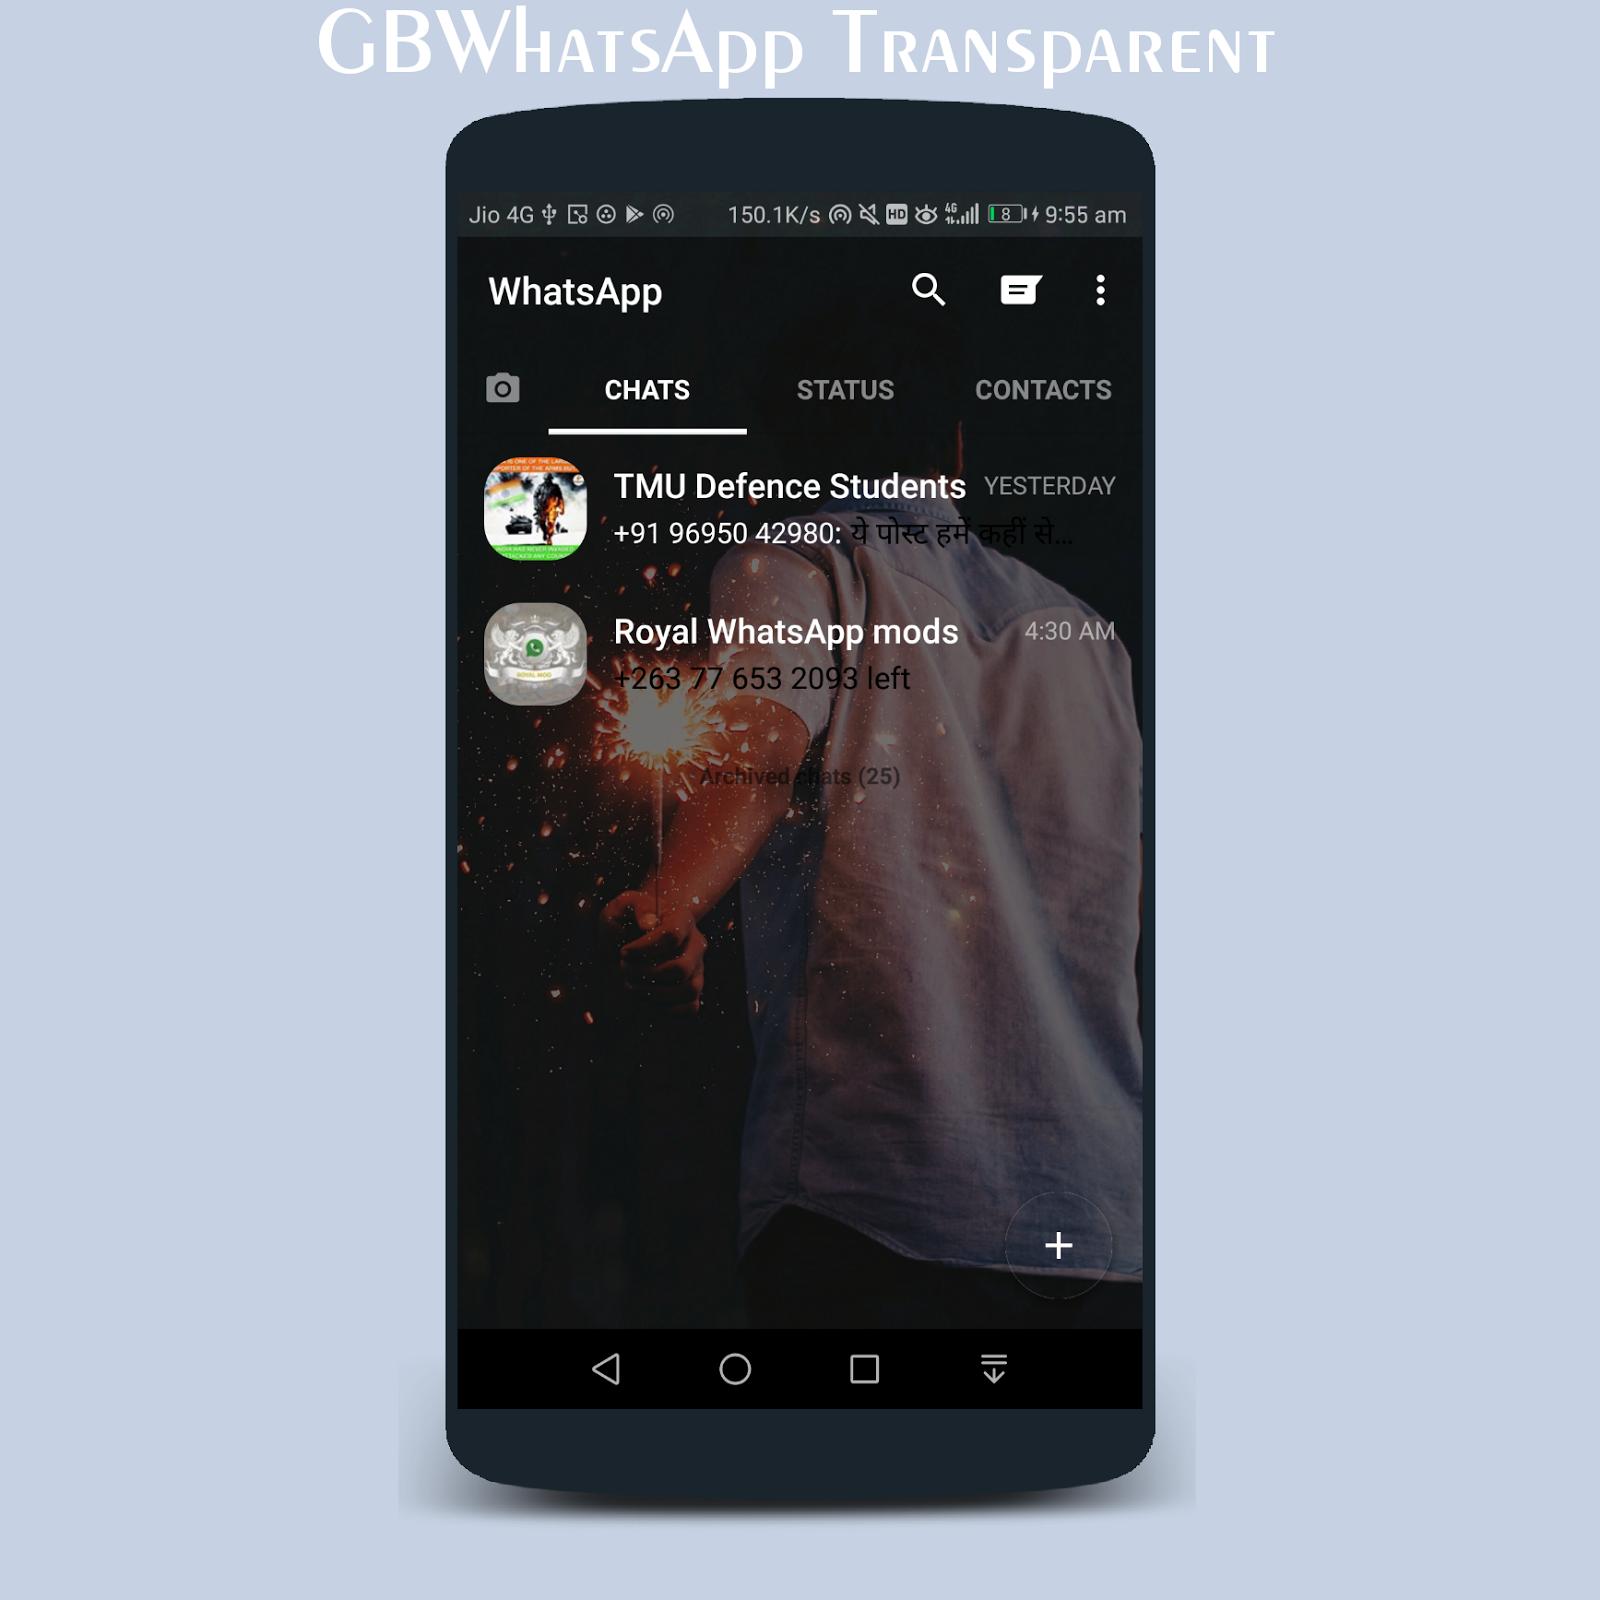 gb whatsapp transparent free download